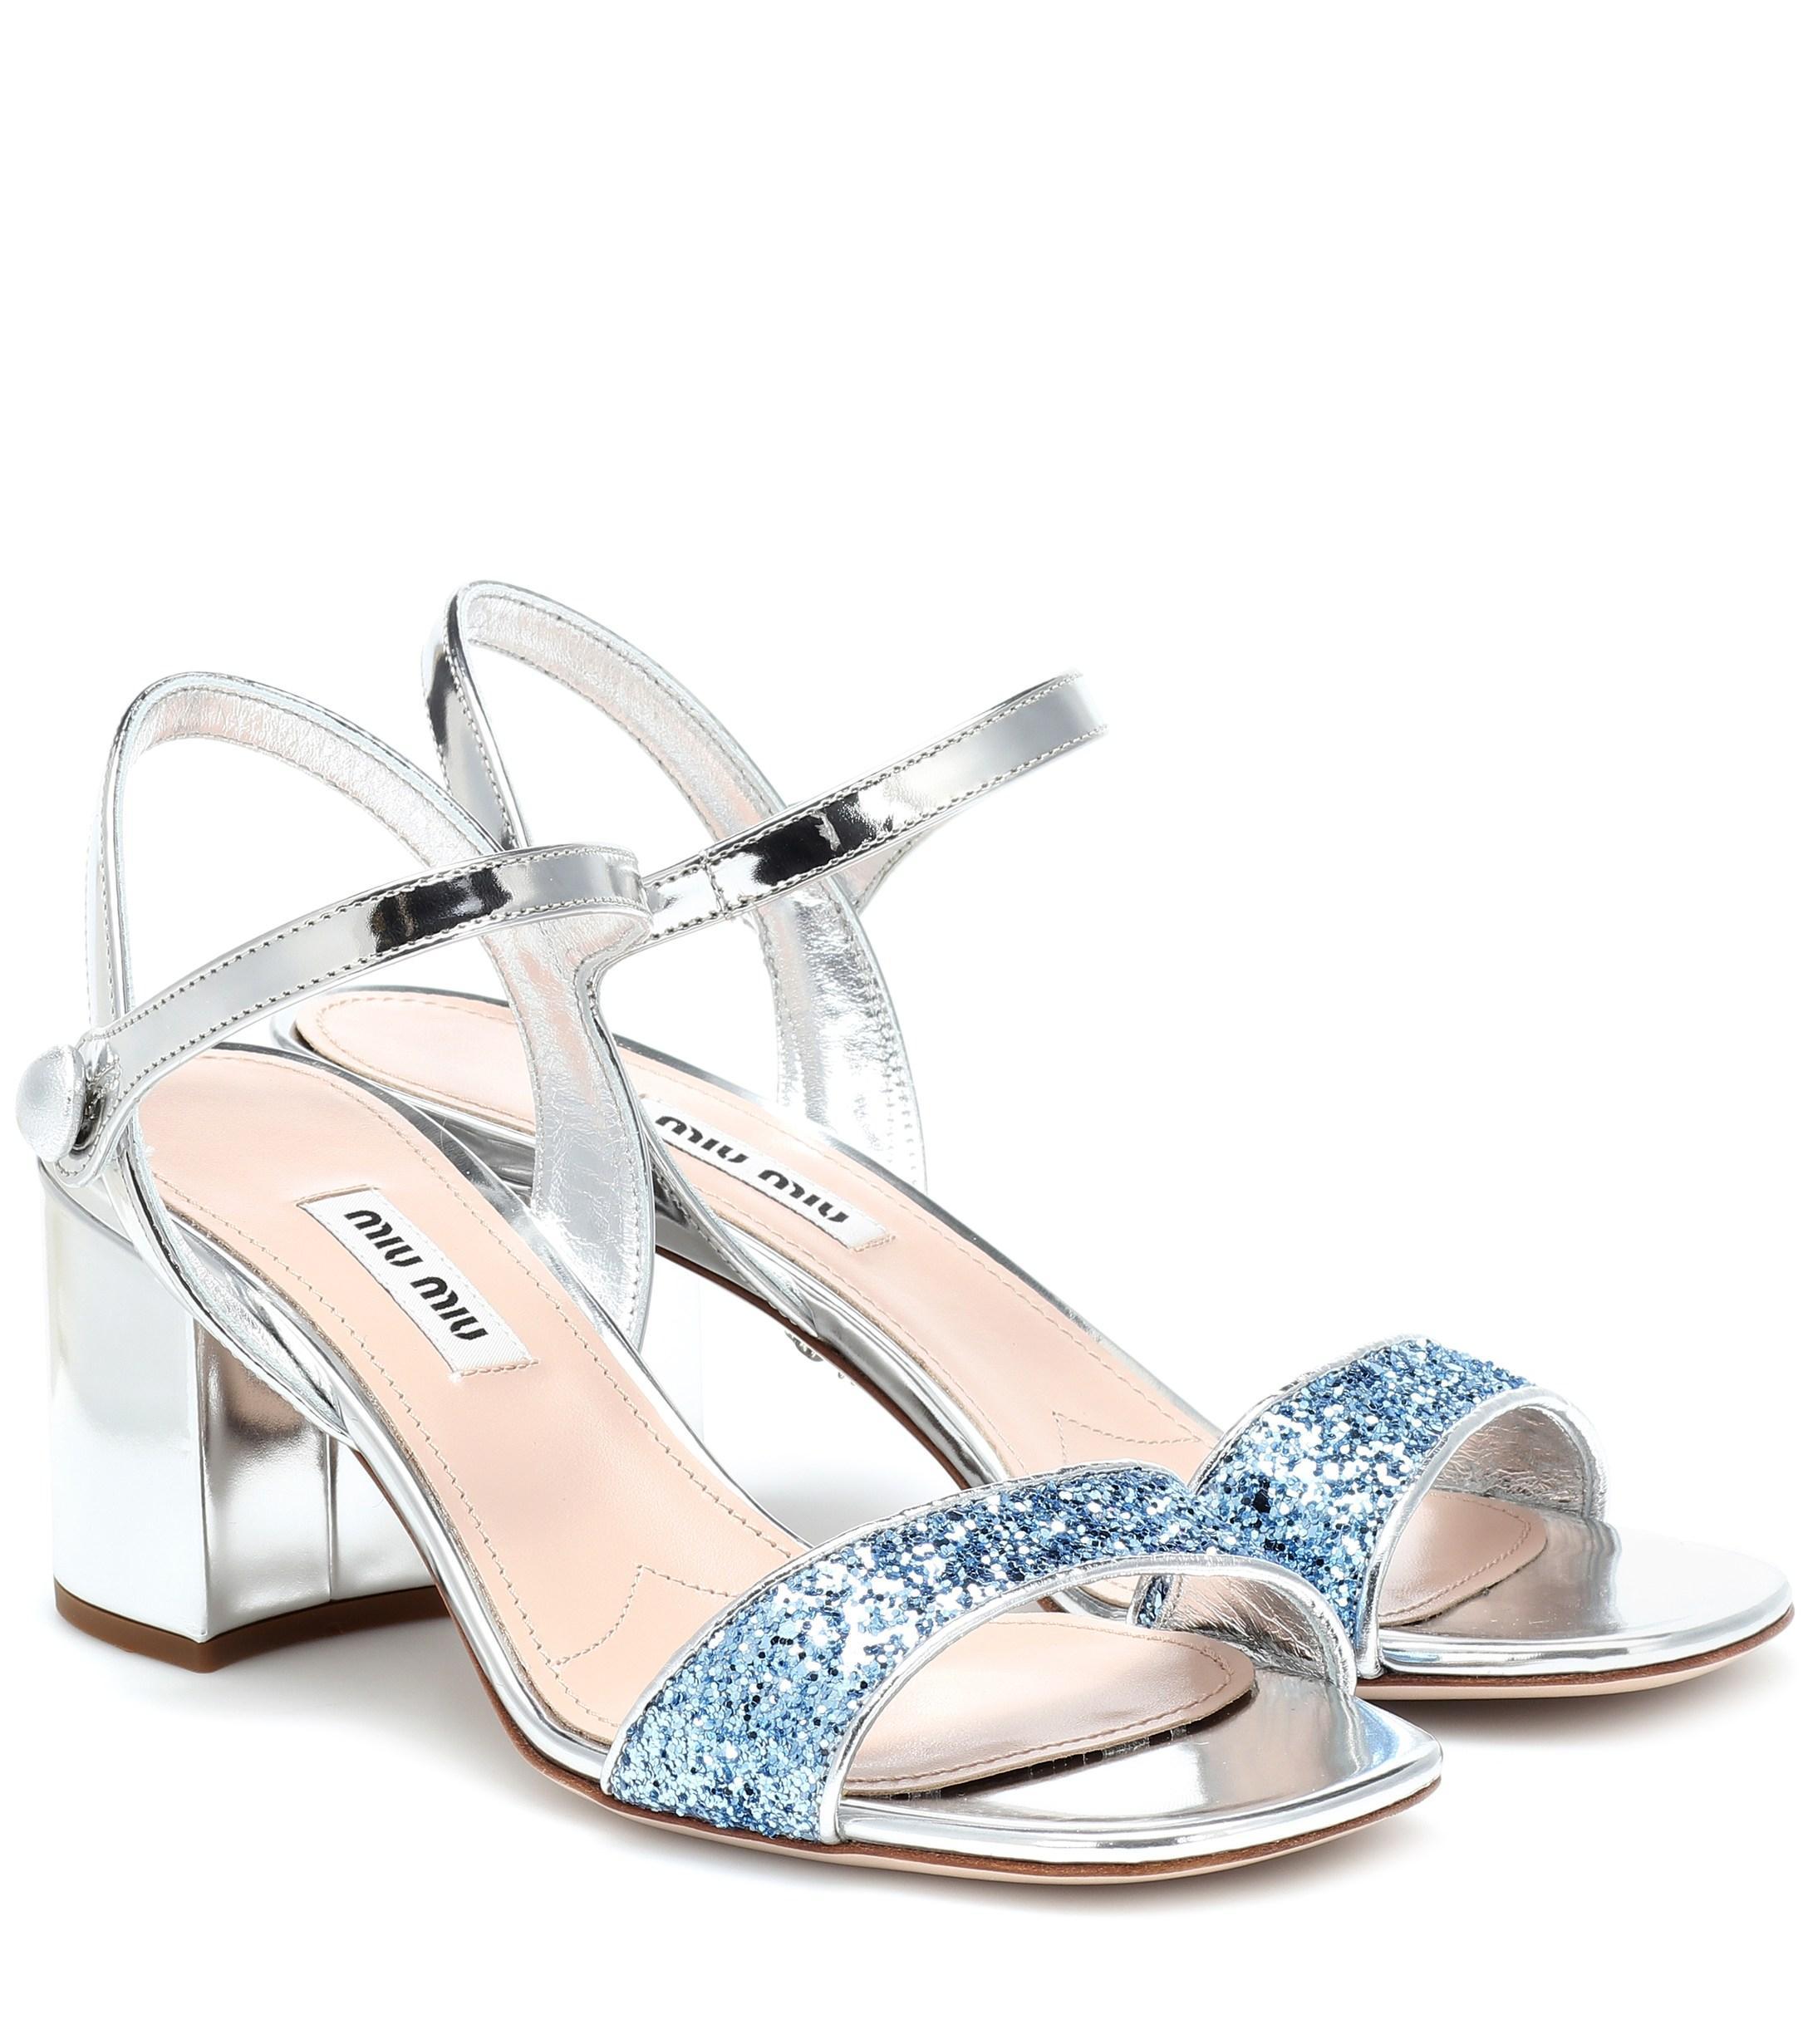 80cd604f5c41 Miu Miu. Women s Exclusive To Mytheresa – Metallic Patent Leather Sandals